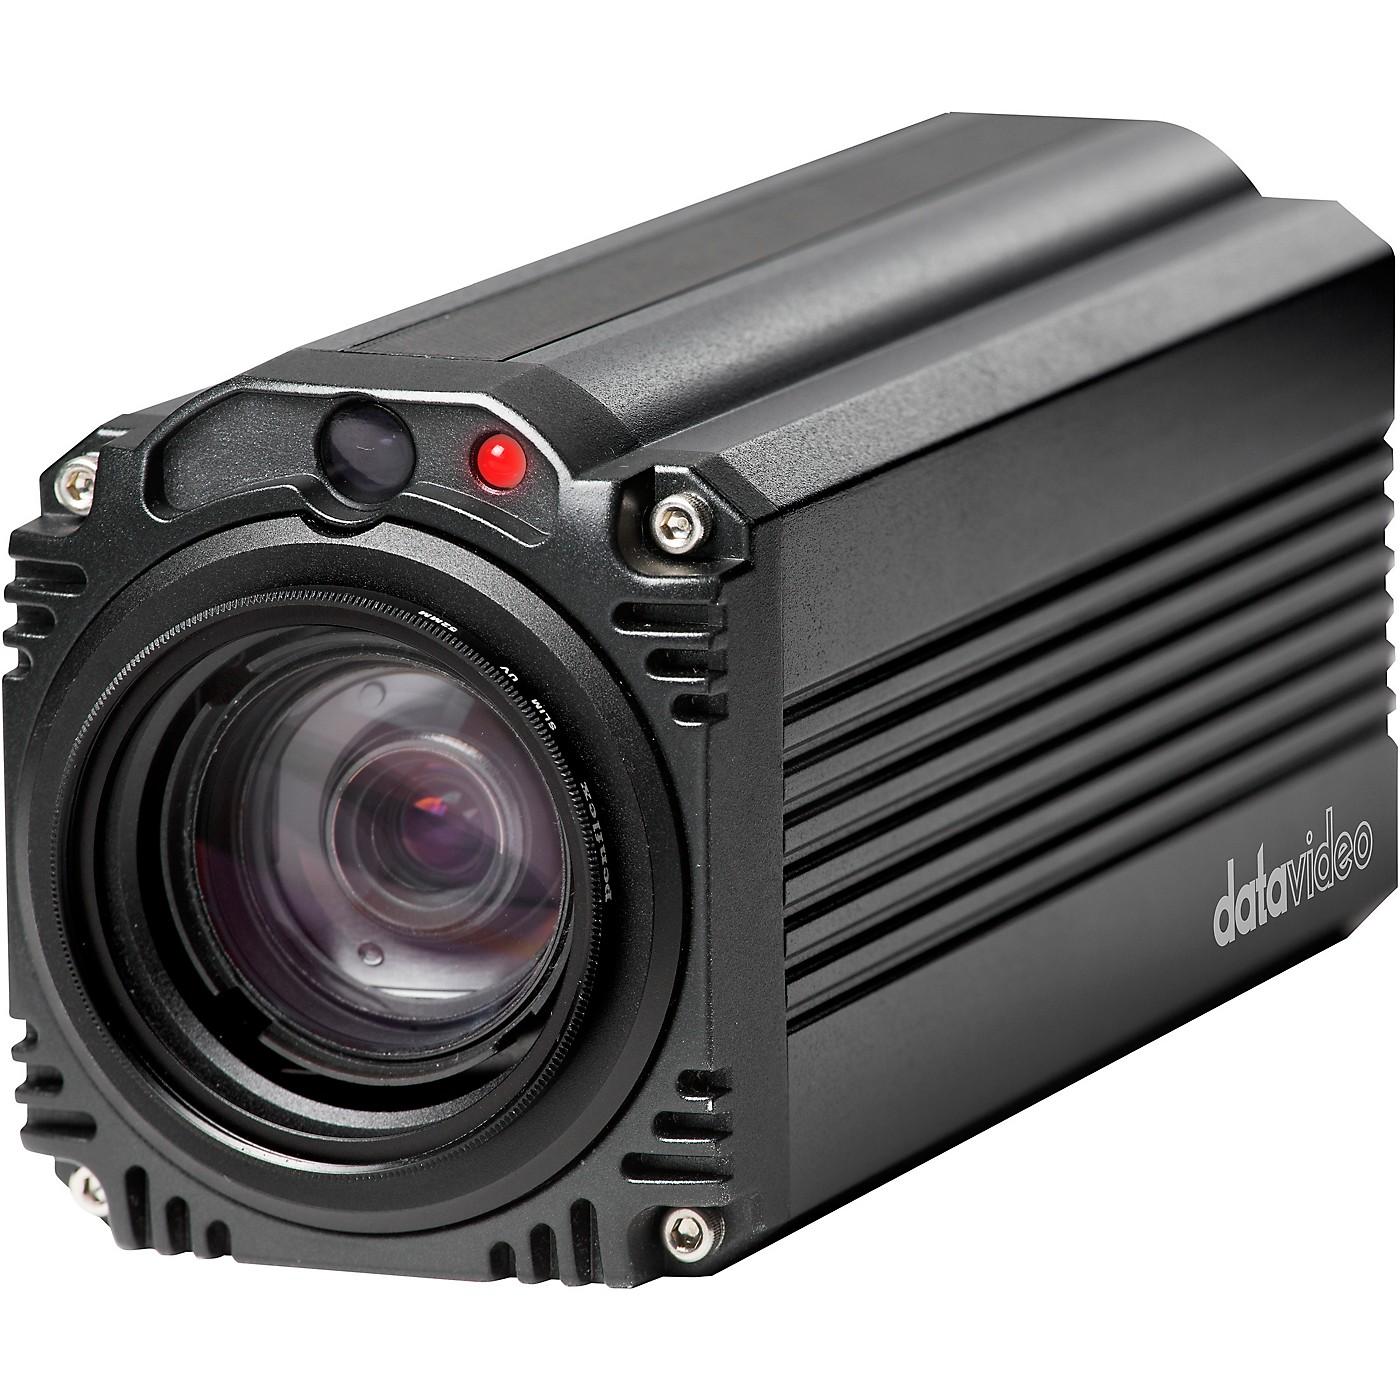 DataVideo Datavideo HD Block Camera With 30X Zoom HD-SDI and HD thumbnail